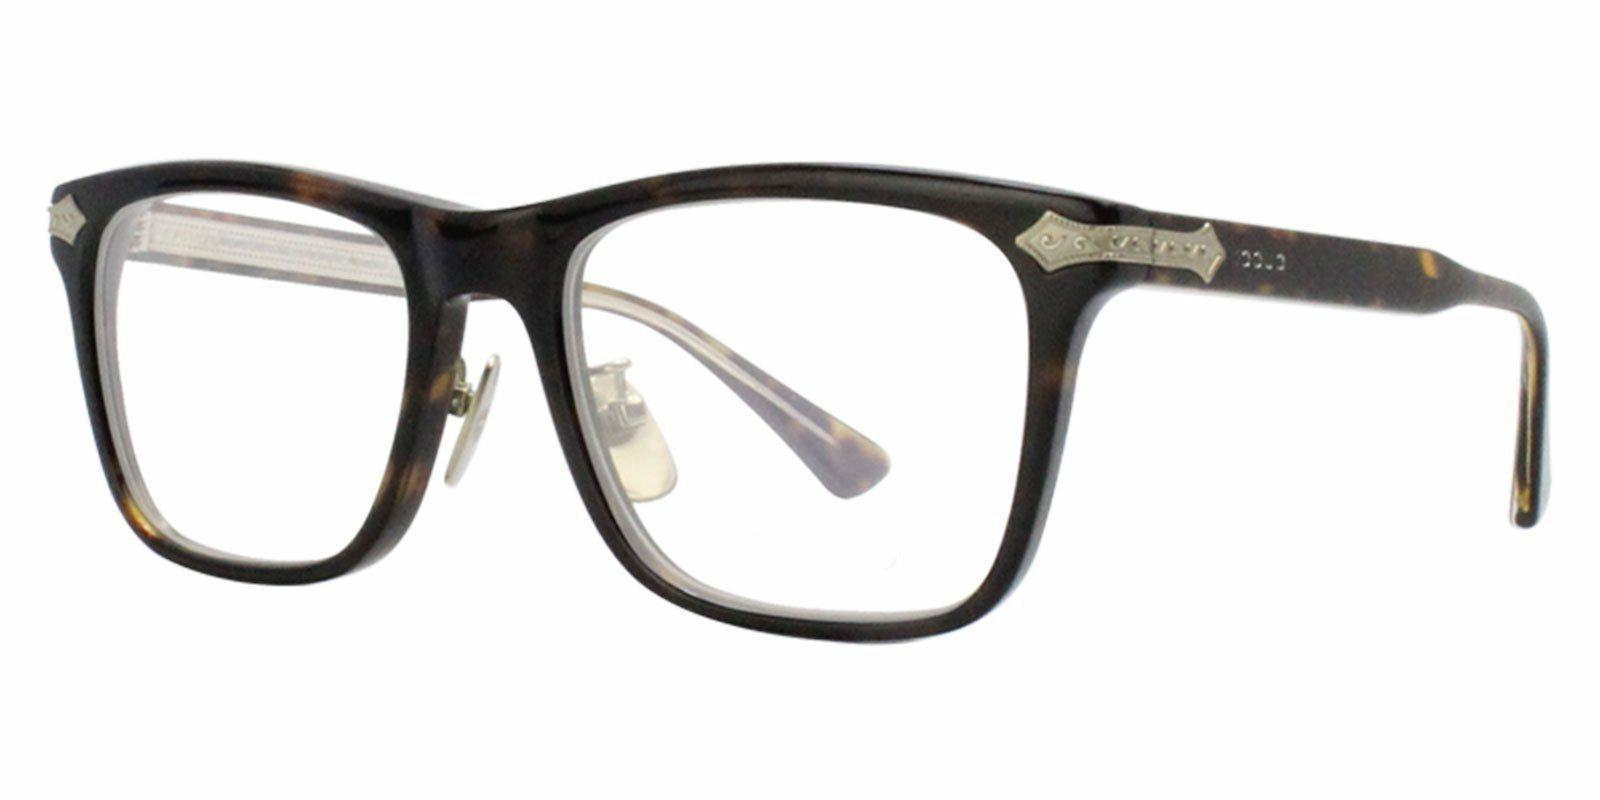 new titanium eyeglasses gg 0069o 002 size